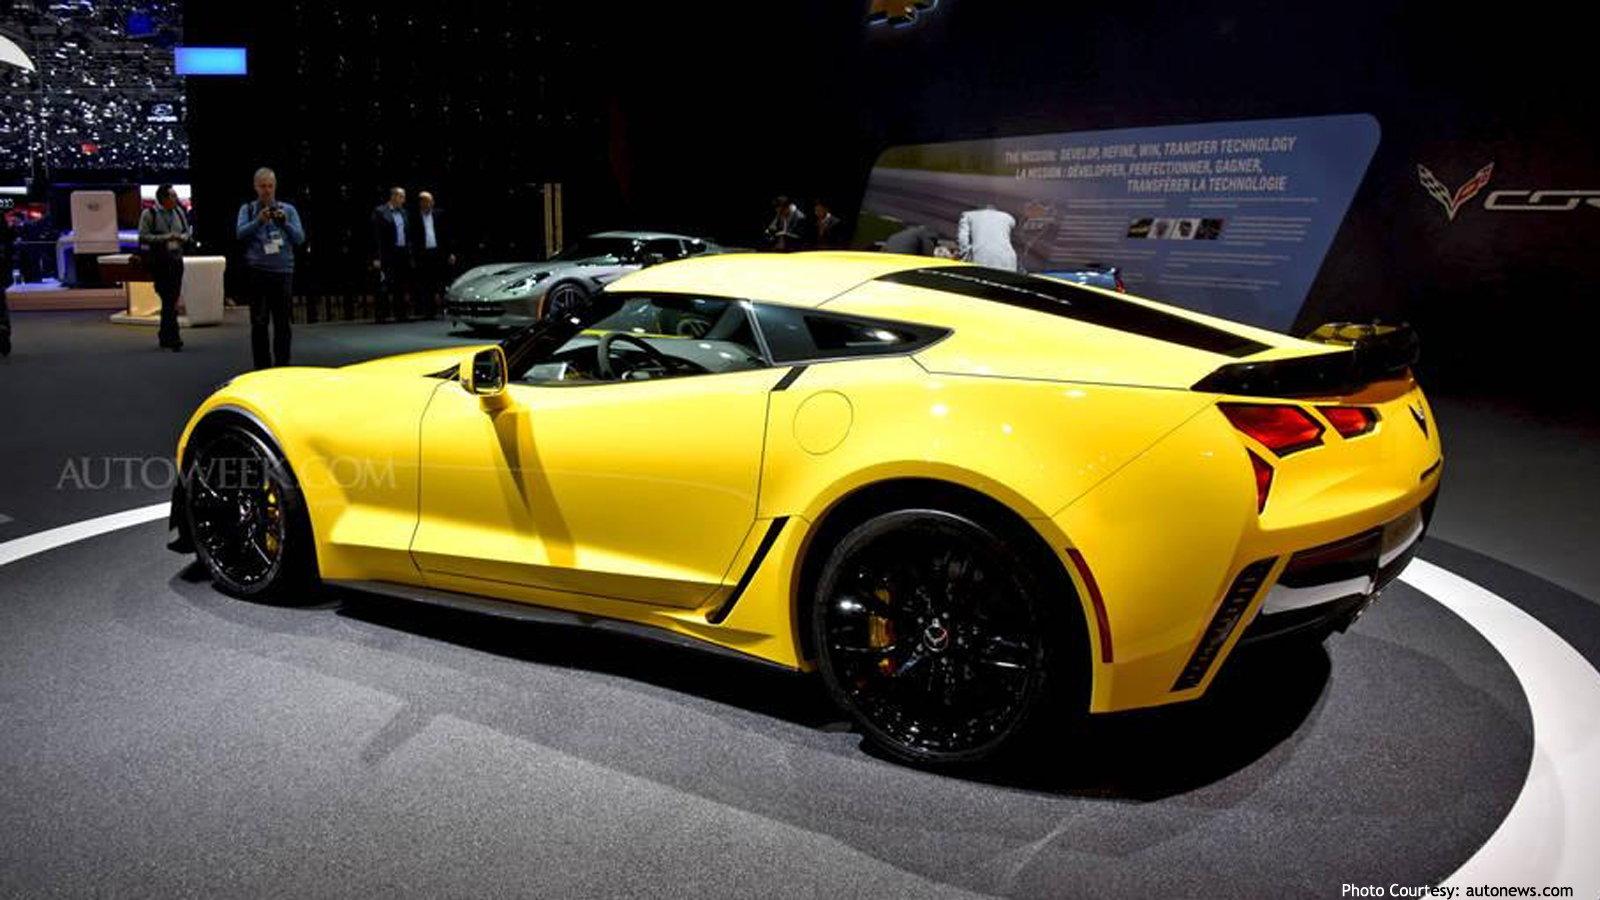 Corvette Midengine Concept